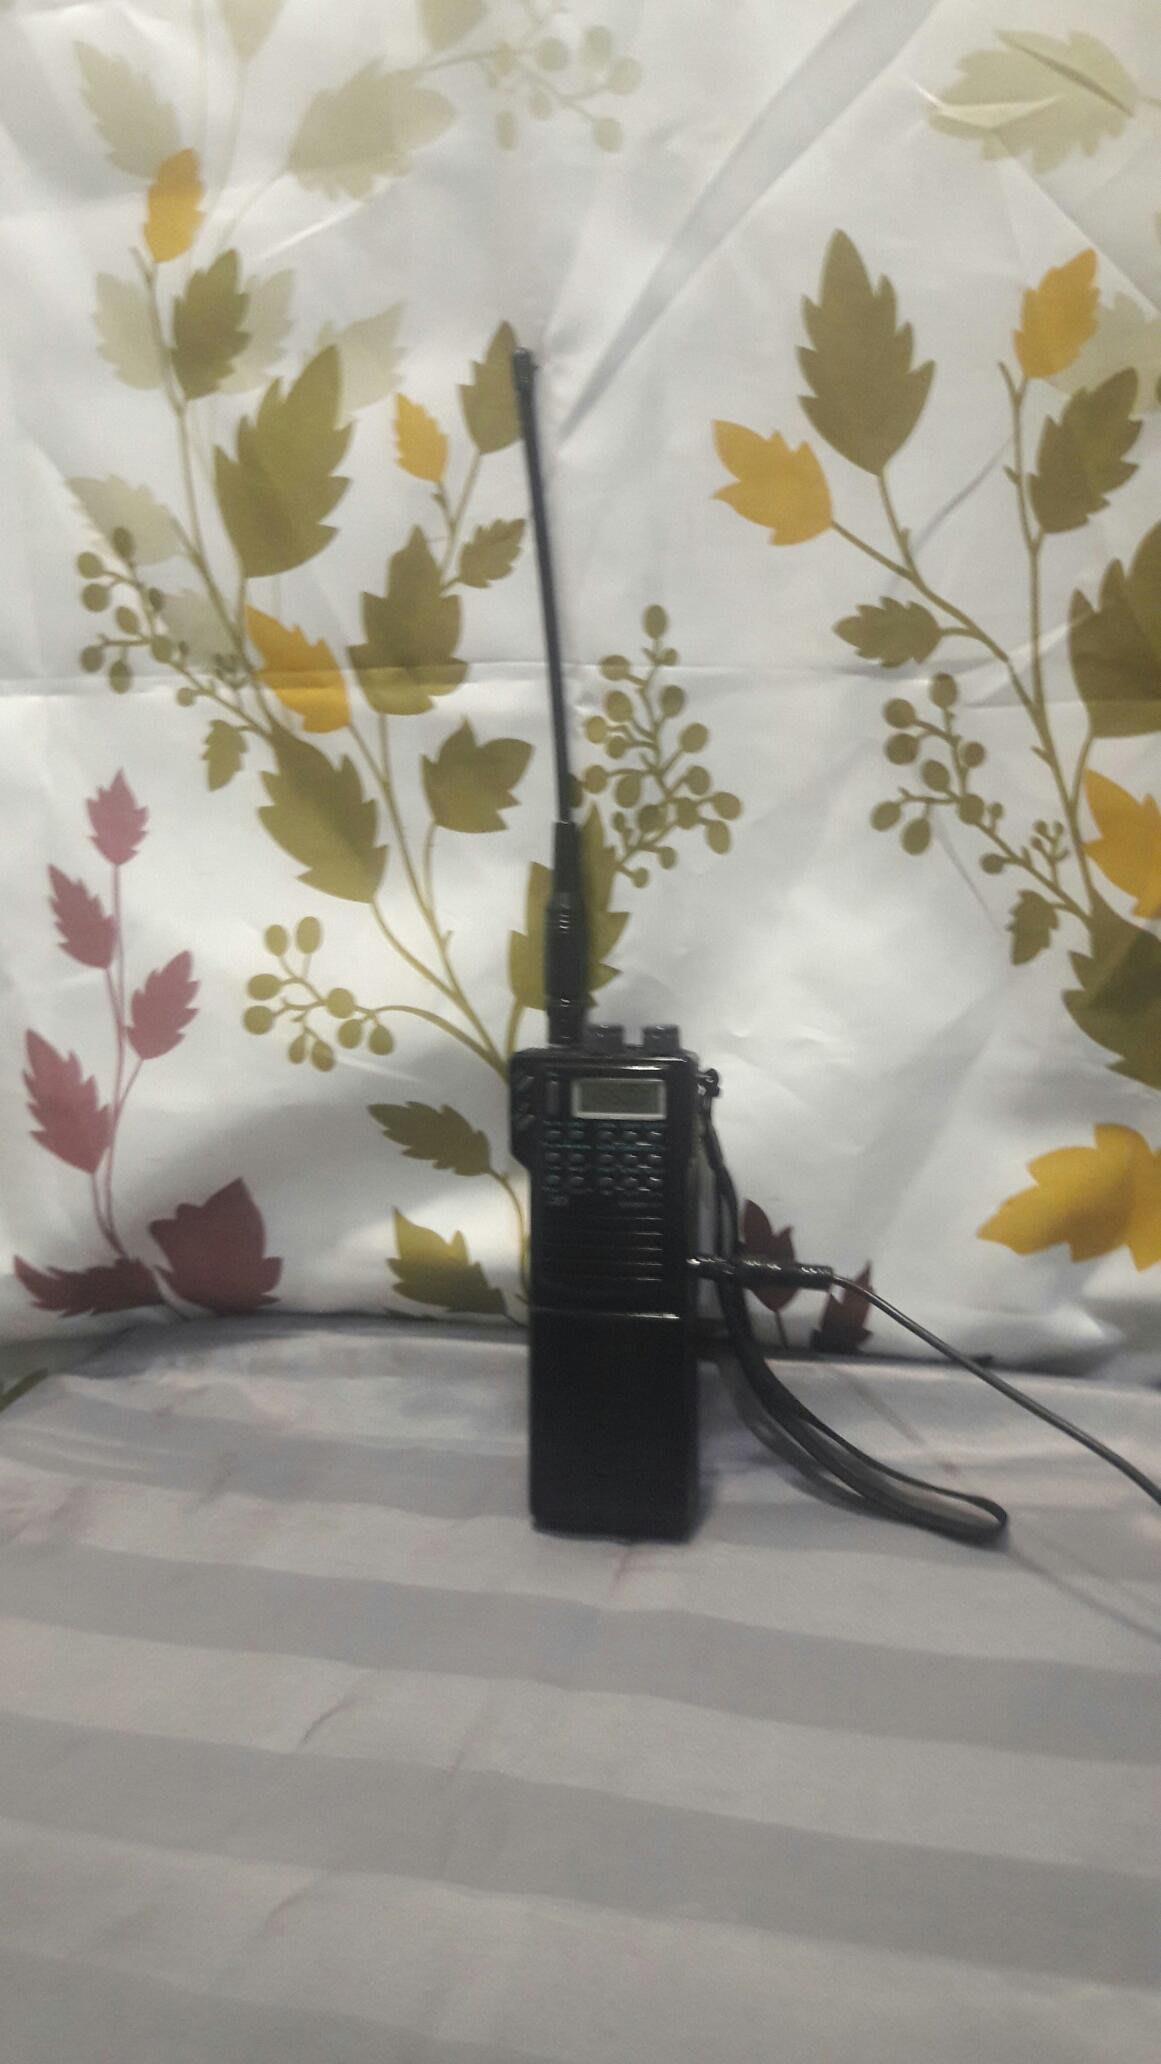 SENDER-450 無線電手機